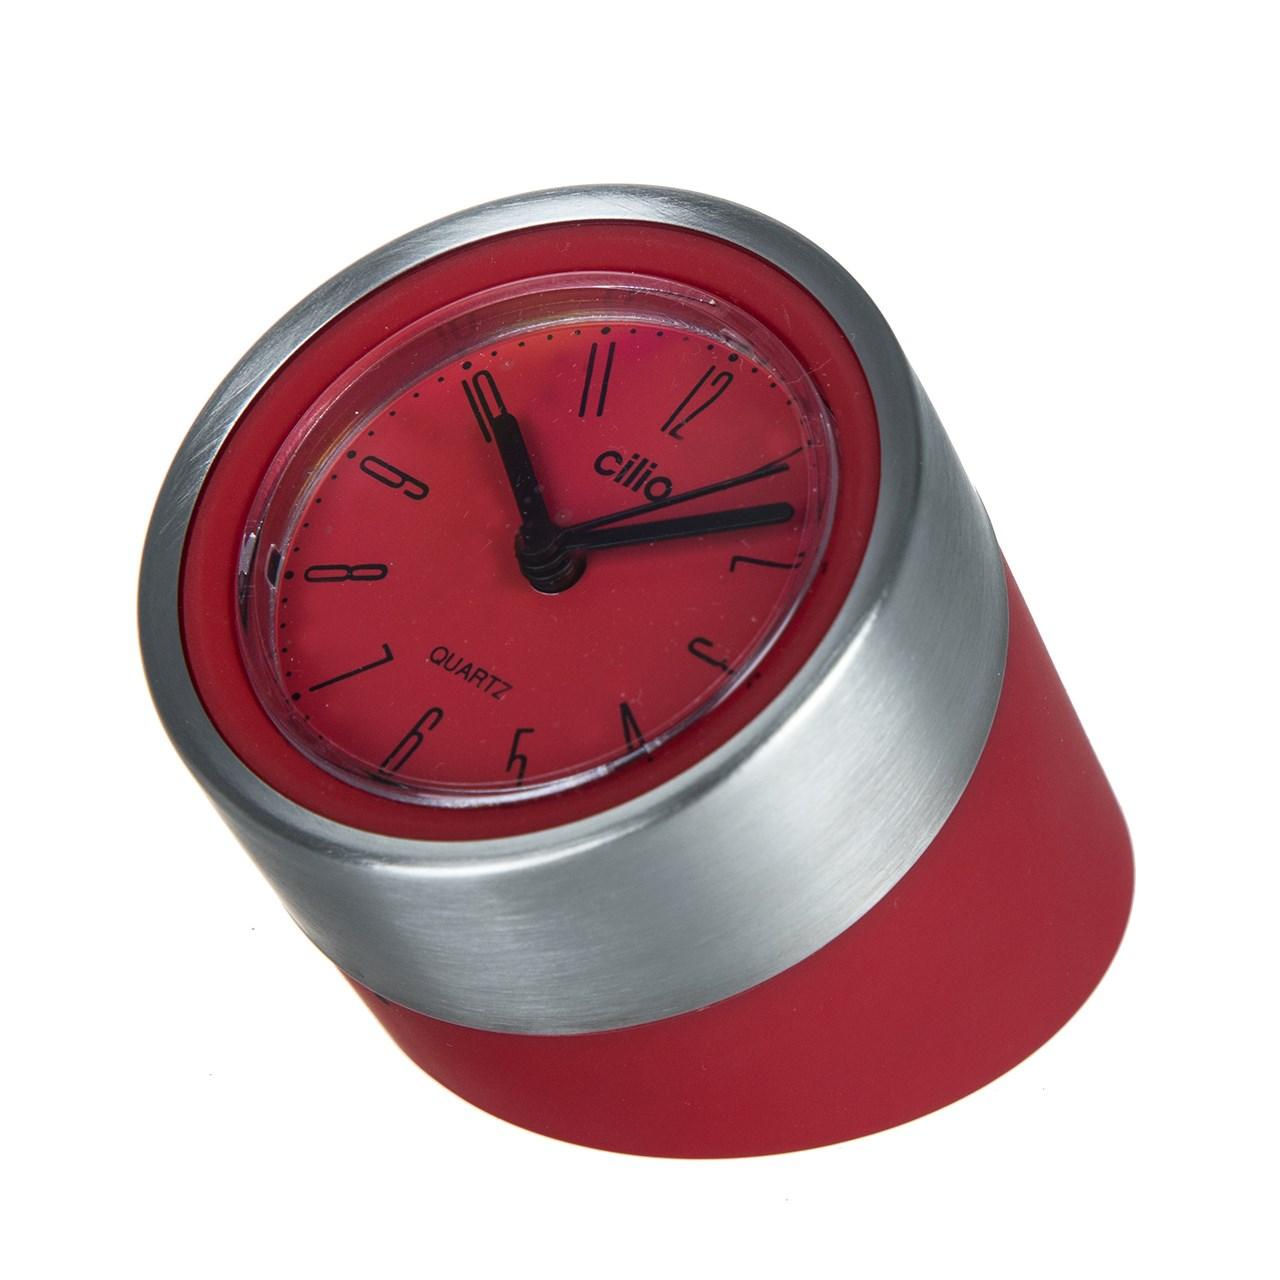 زمان سنج سیلیو کد 2948